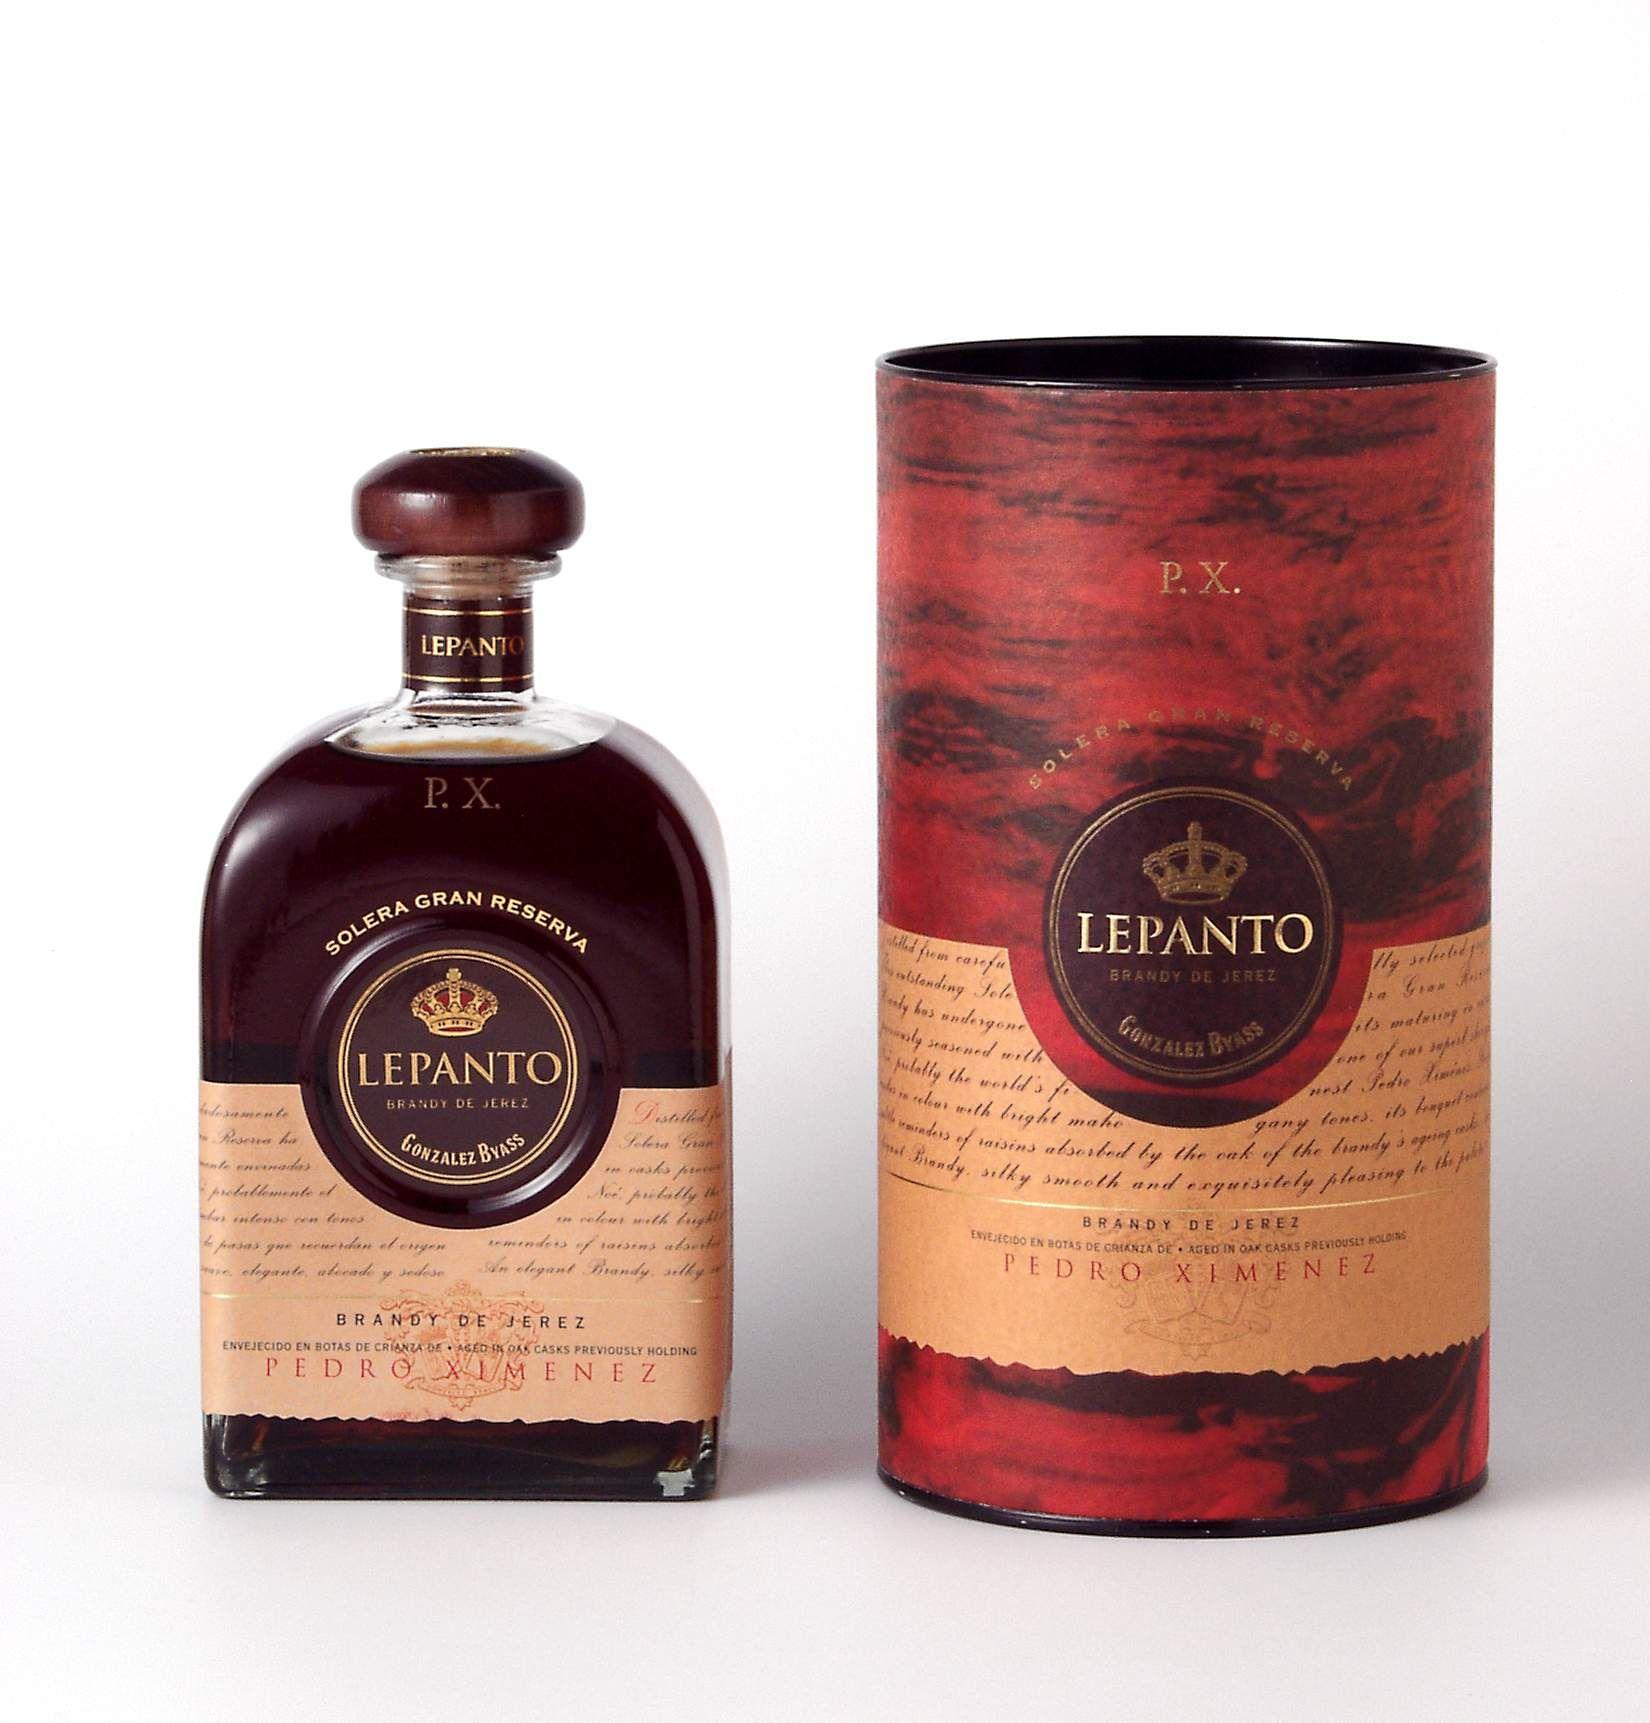 Lepanto Pedro Ximenez Whiskey Bottle Lepanto Brandy